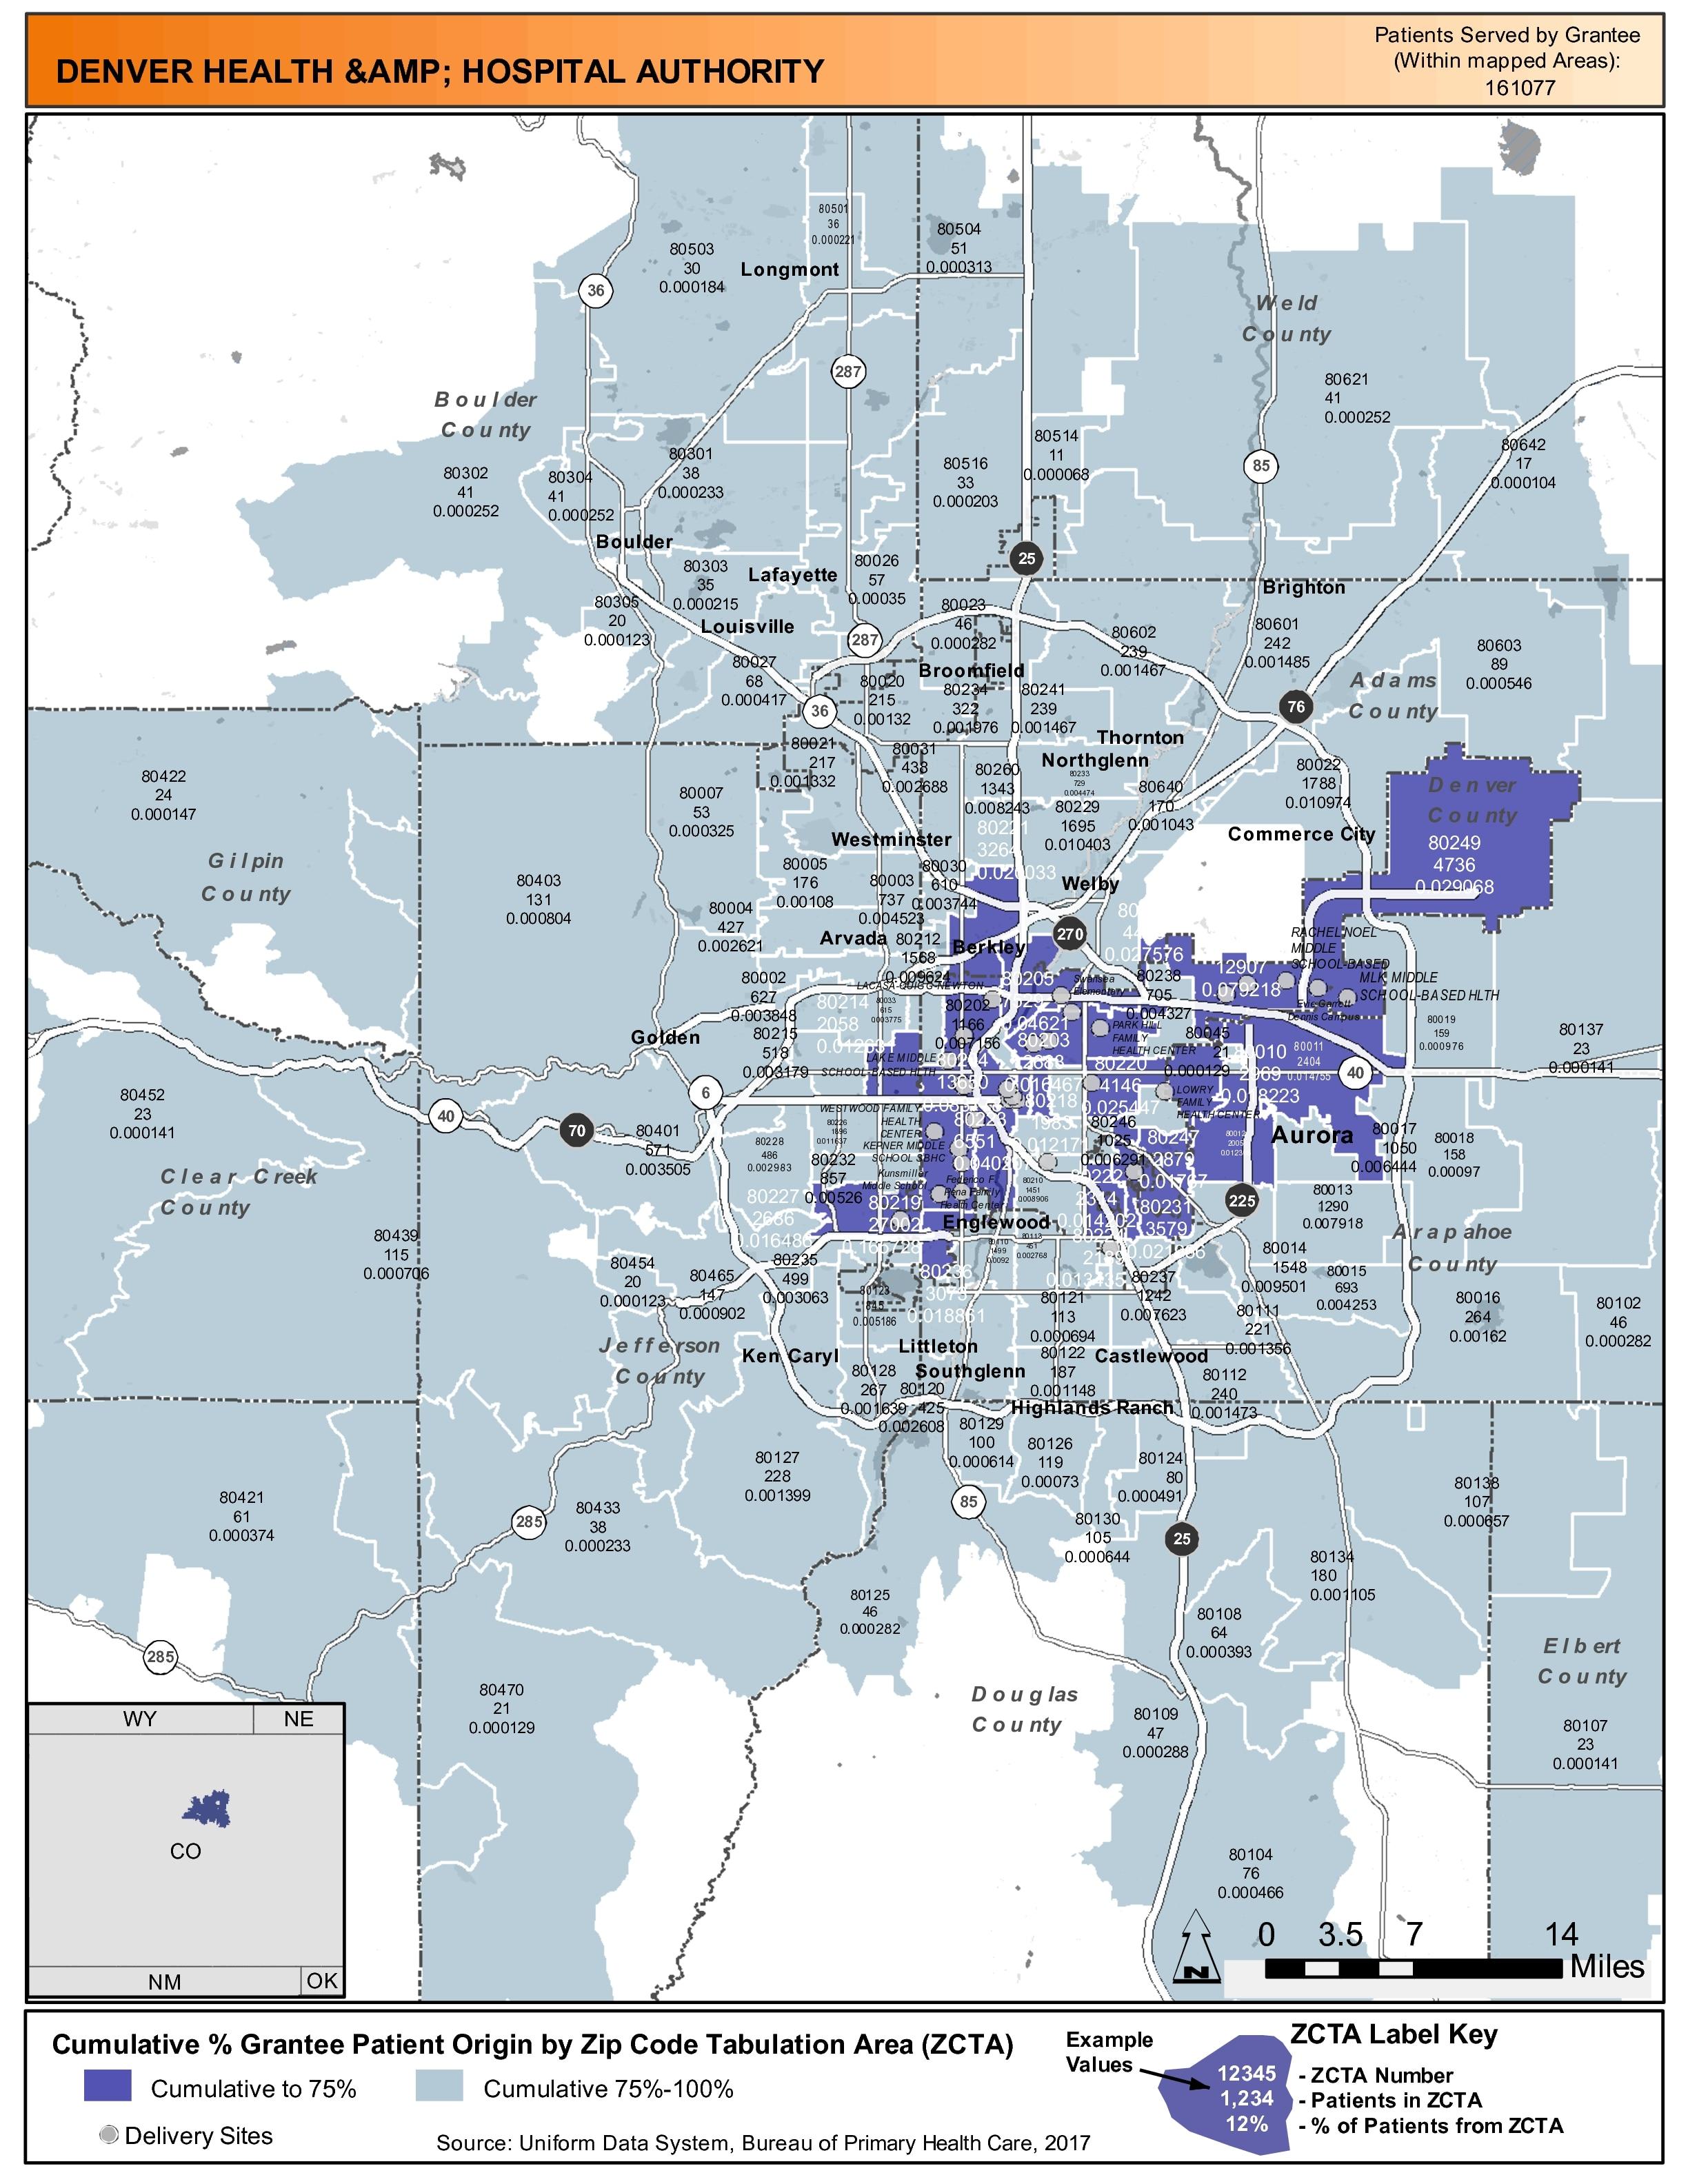 2017 Denver Health & Hospital Authority Health Center Program ... on